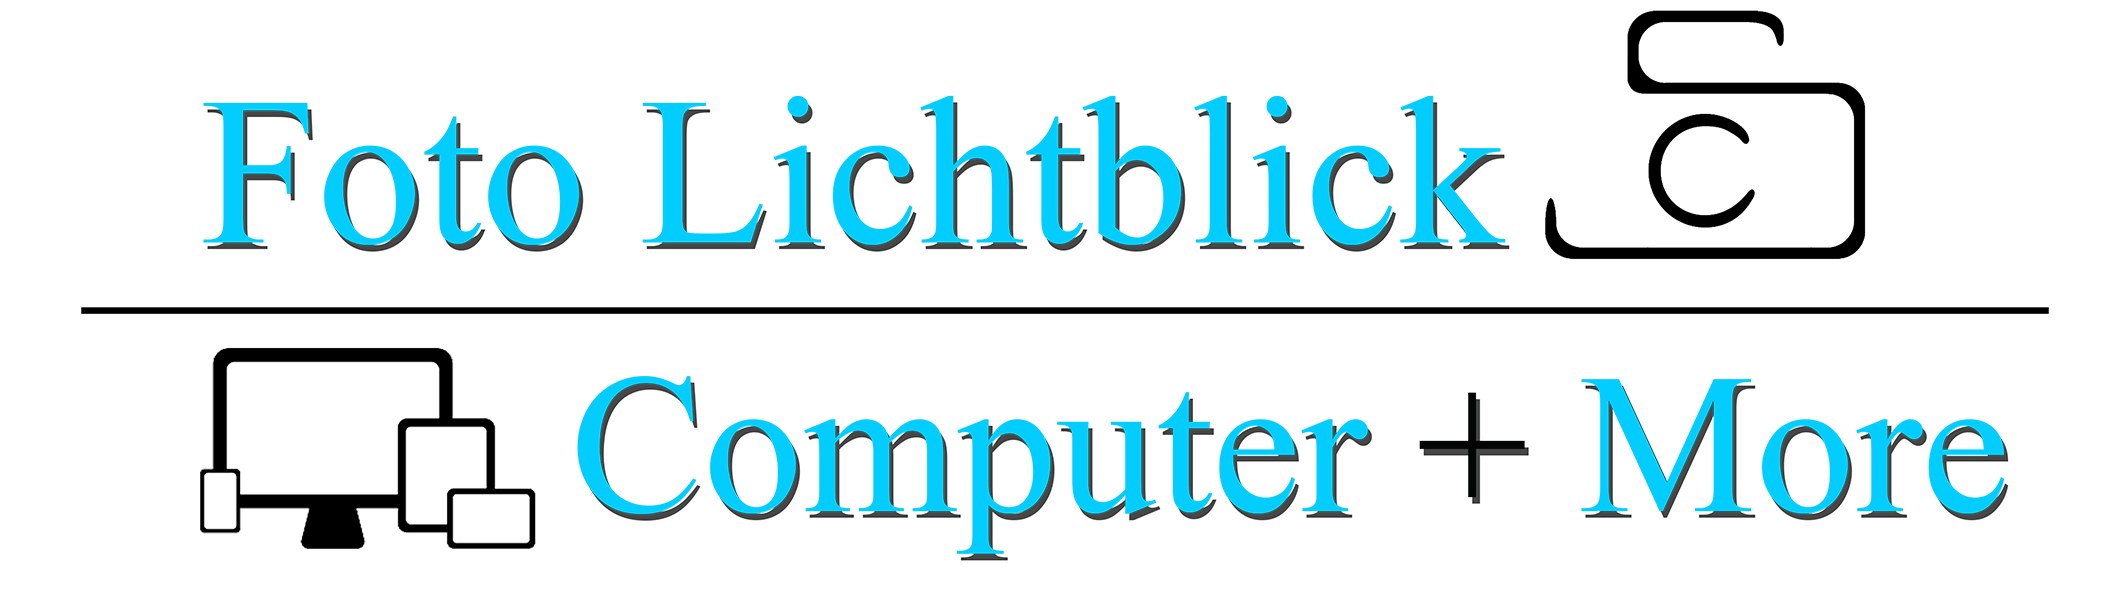 Computerservice oelsnitzvogtl. foto oelsnitzvogtl. fotostudio oelsnitzvogtl.